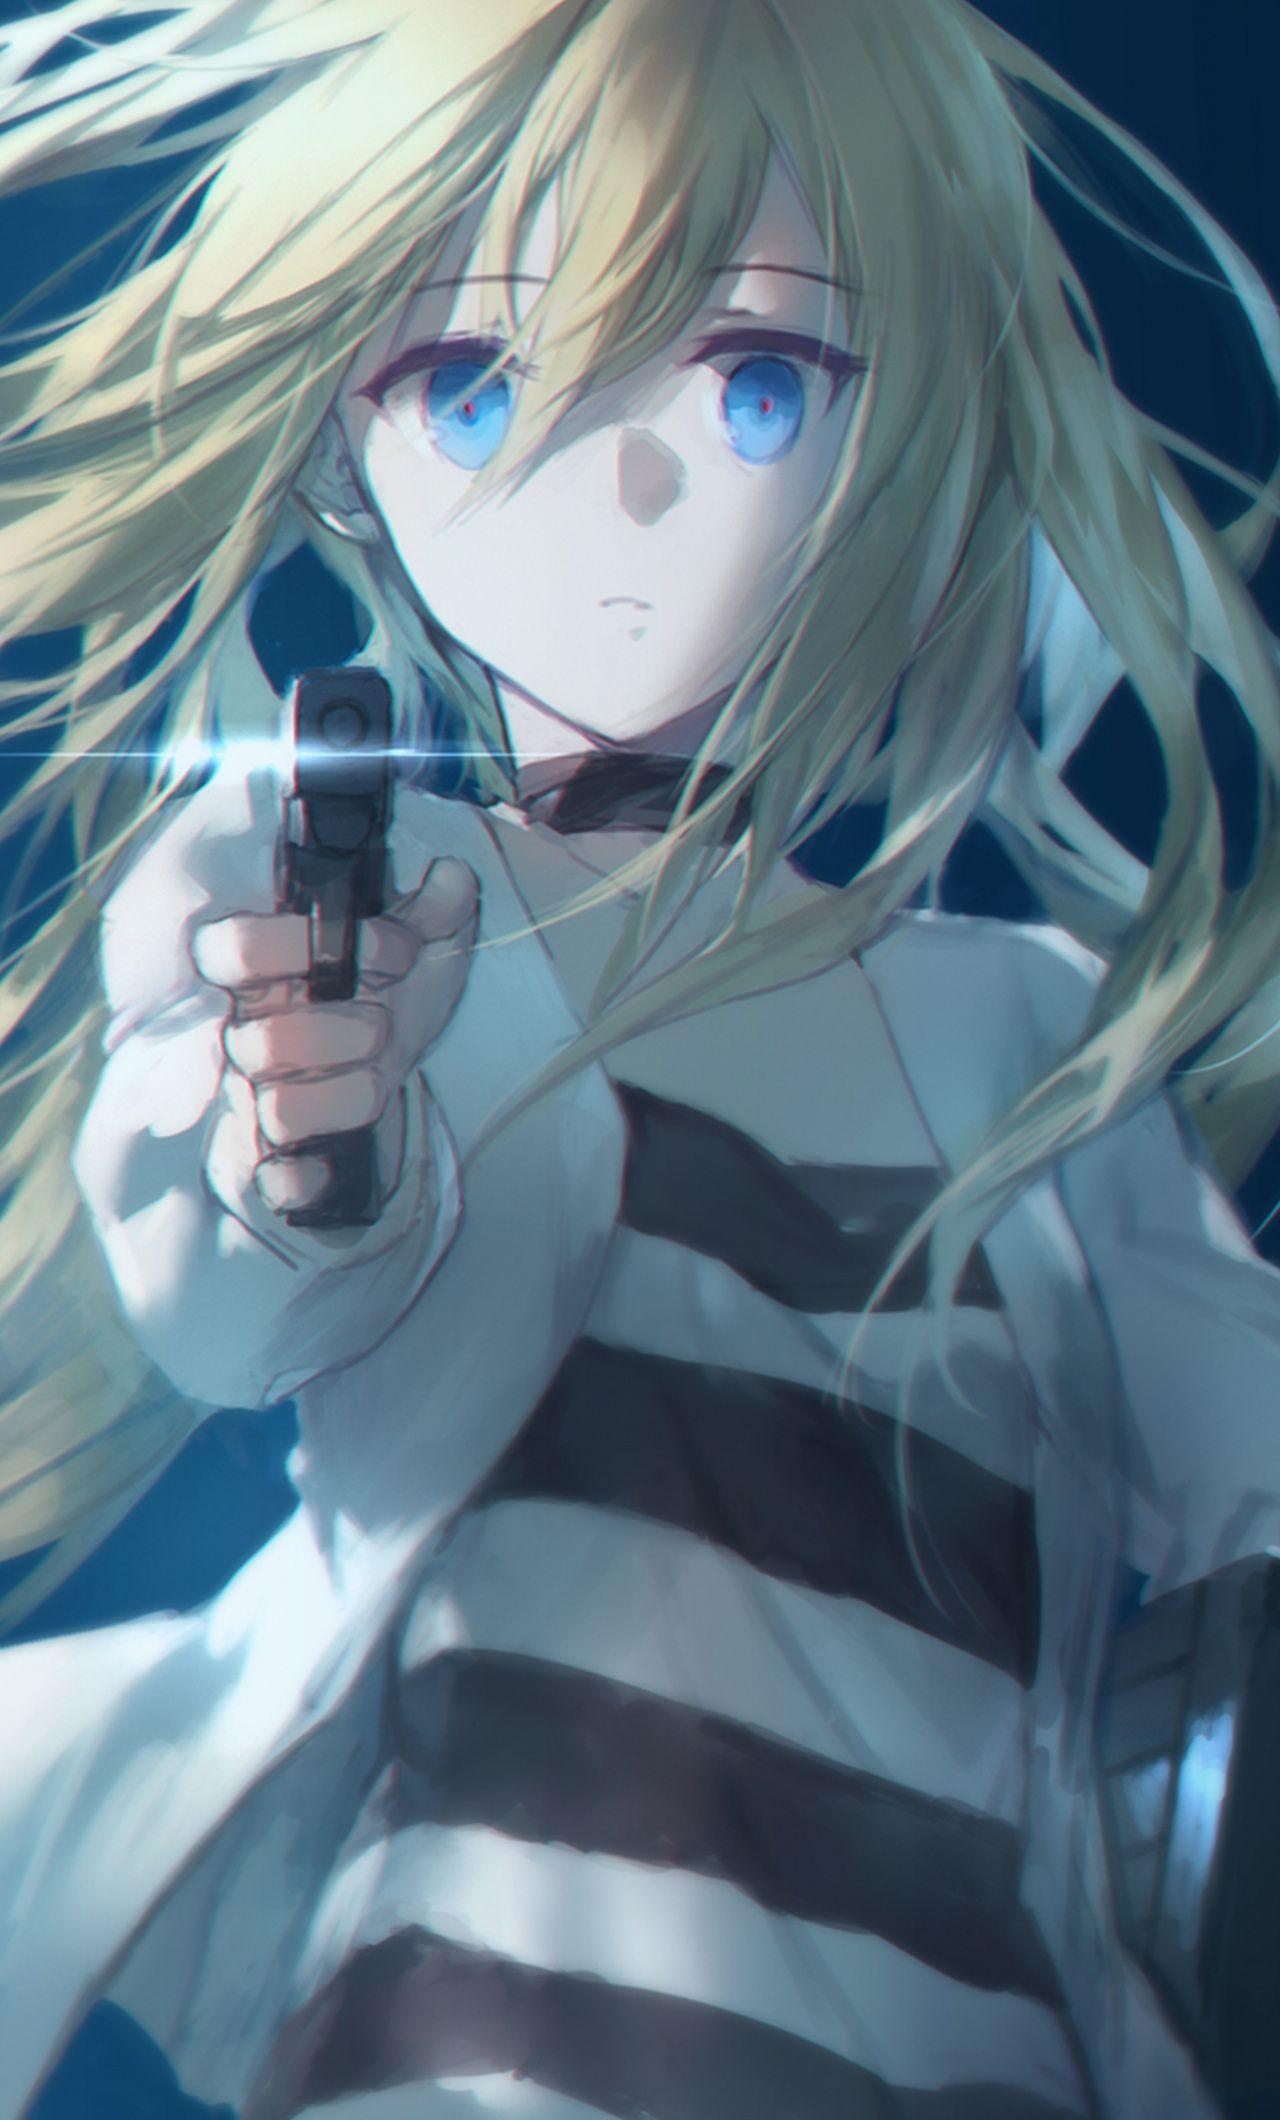 Satsuriku no Tenshi, Rachel Gardner, angel of death, anime girl wallpaper  -  #angel #Anime #animeangel #DEATH #Gardner #Girl #Rachel #Satsuriku #Tenshi #wallpaper